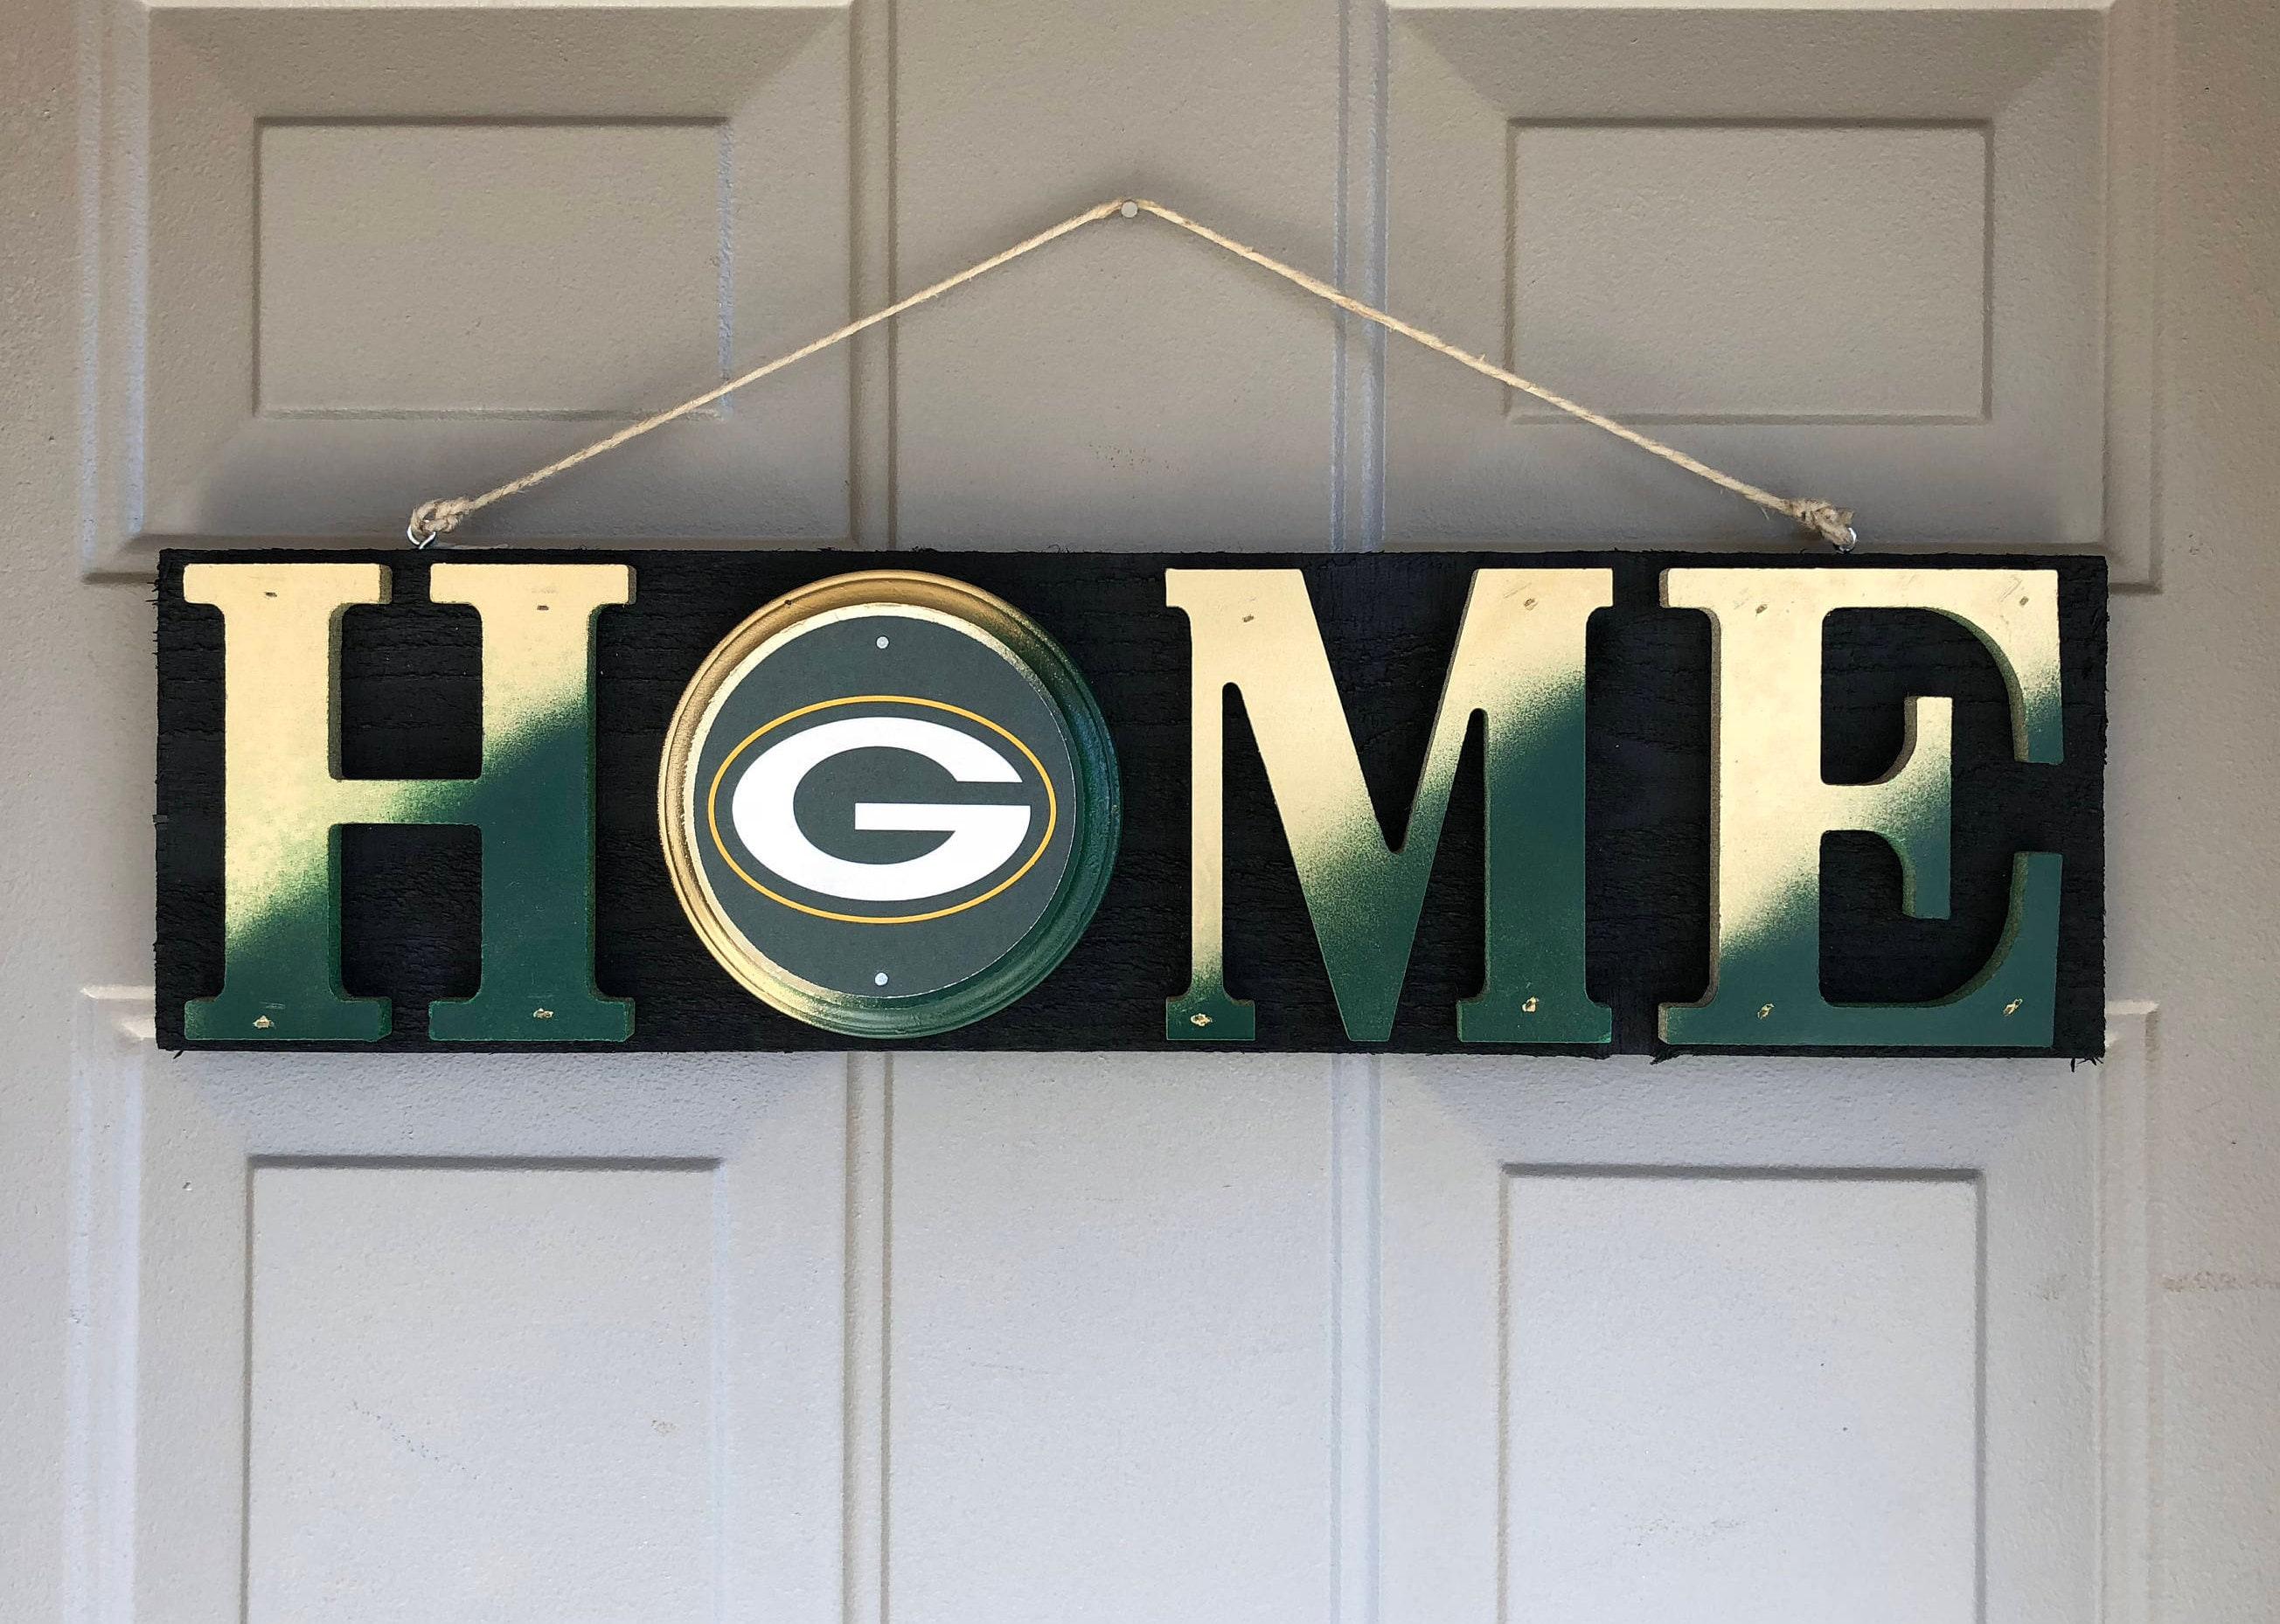 50 & Green Bay Packers Green Bay Decor Green Bay Packers Fan | Etsy